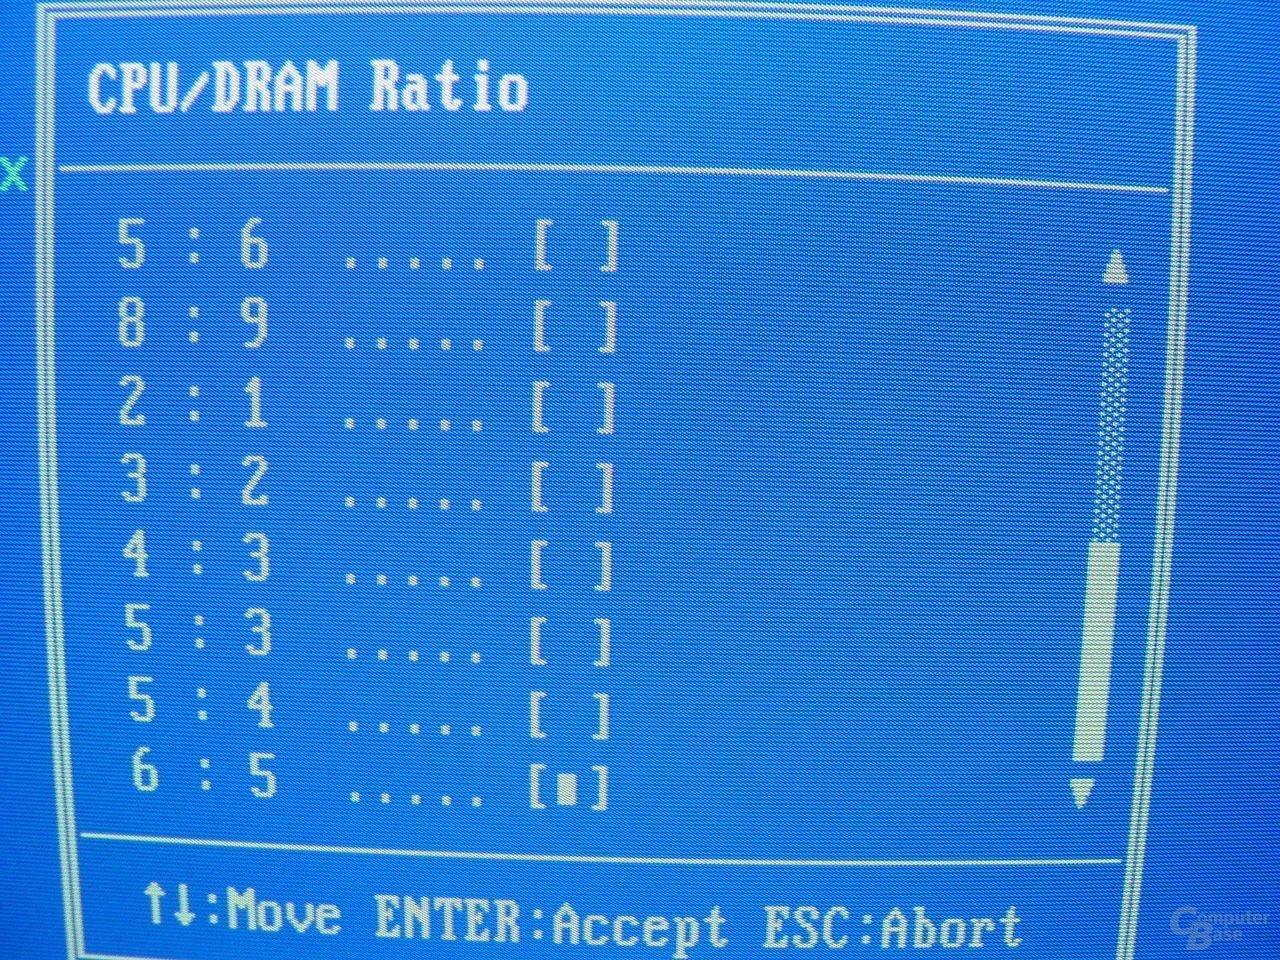 EPoX EP-4SDA5+ - Bios - RAM-Ratio - 2